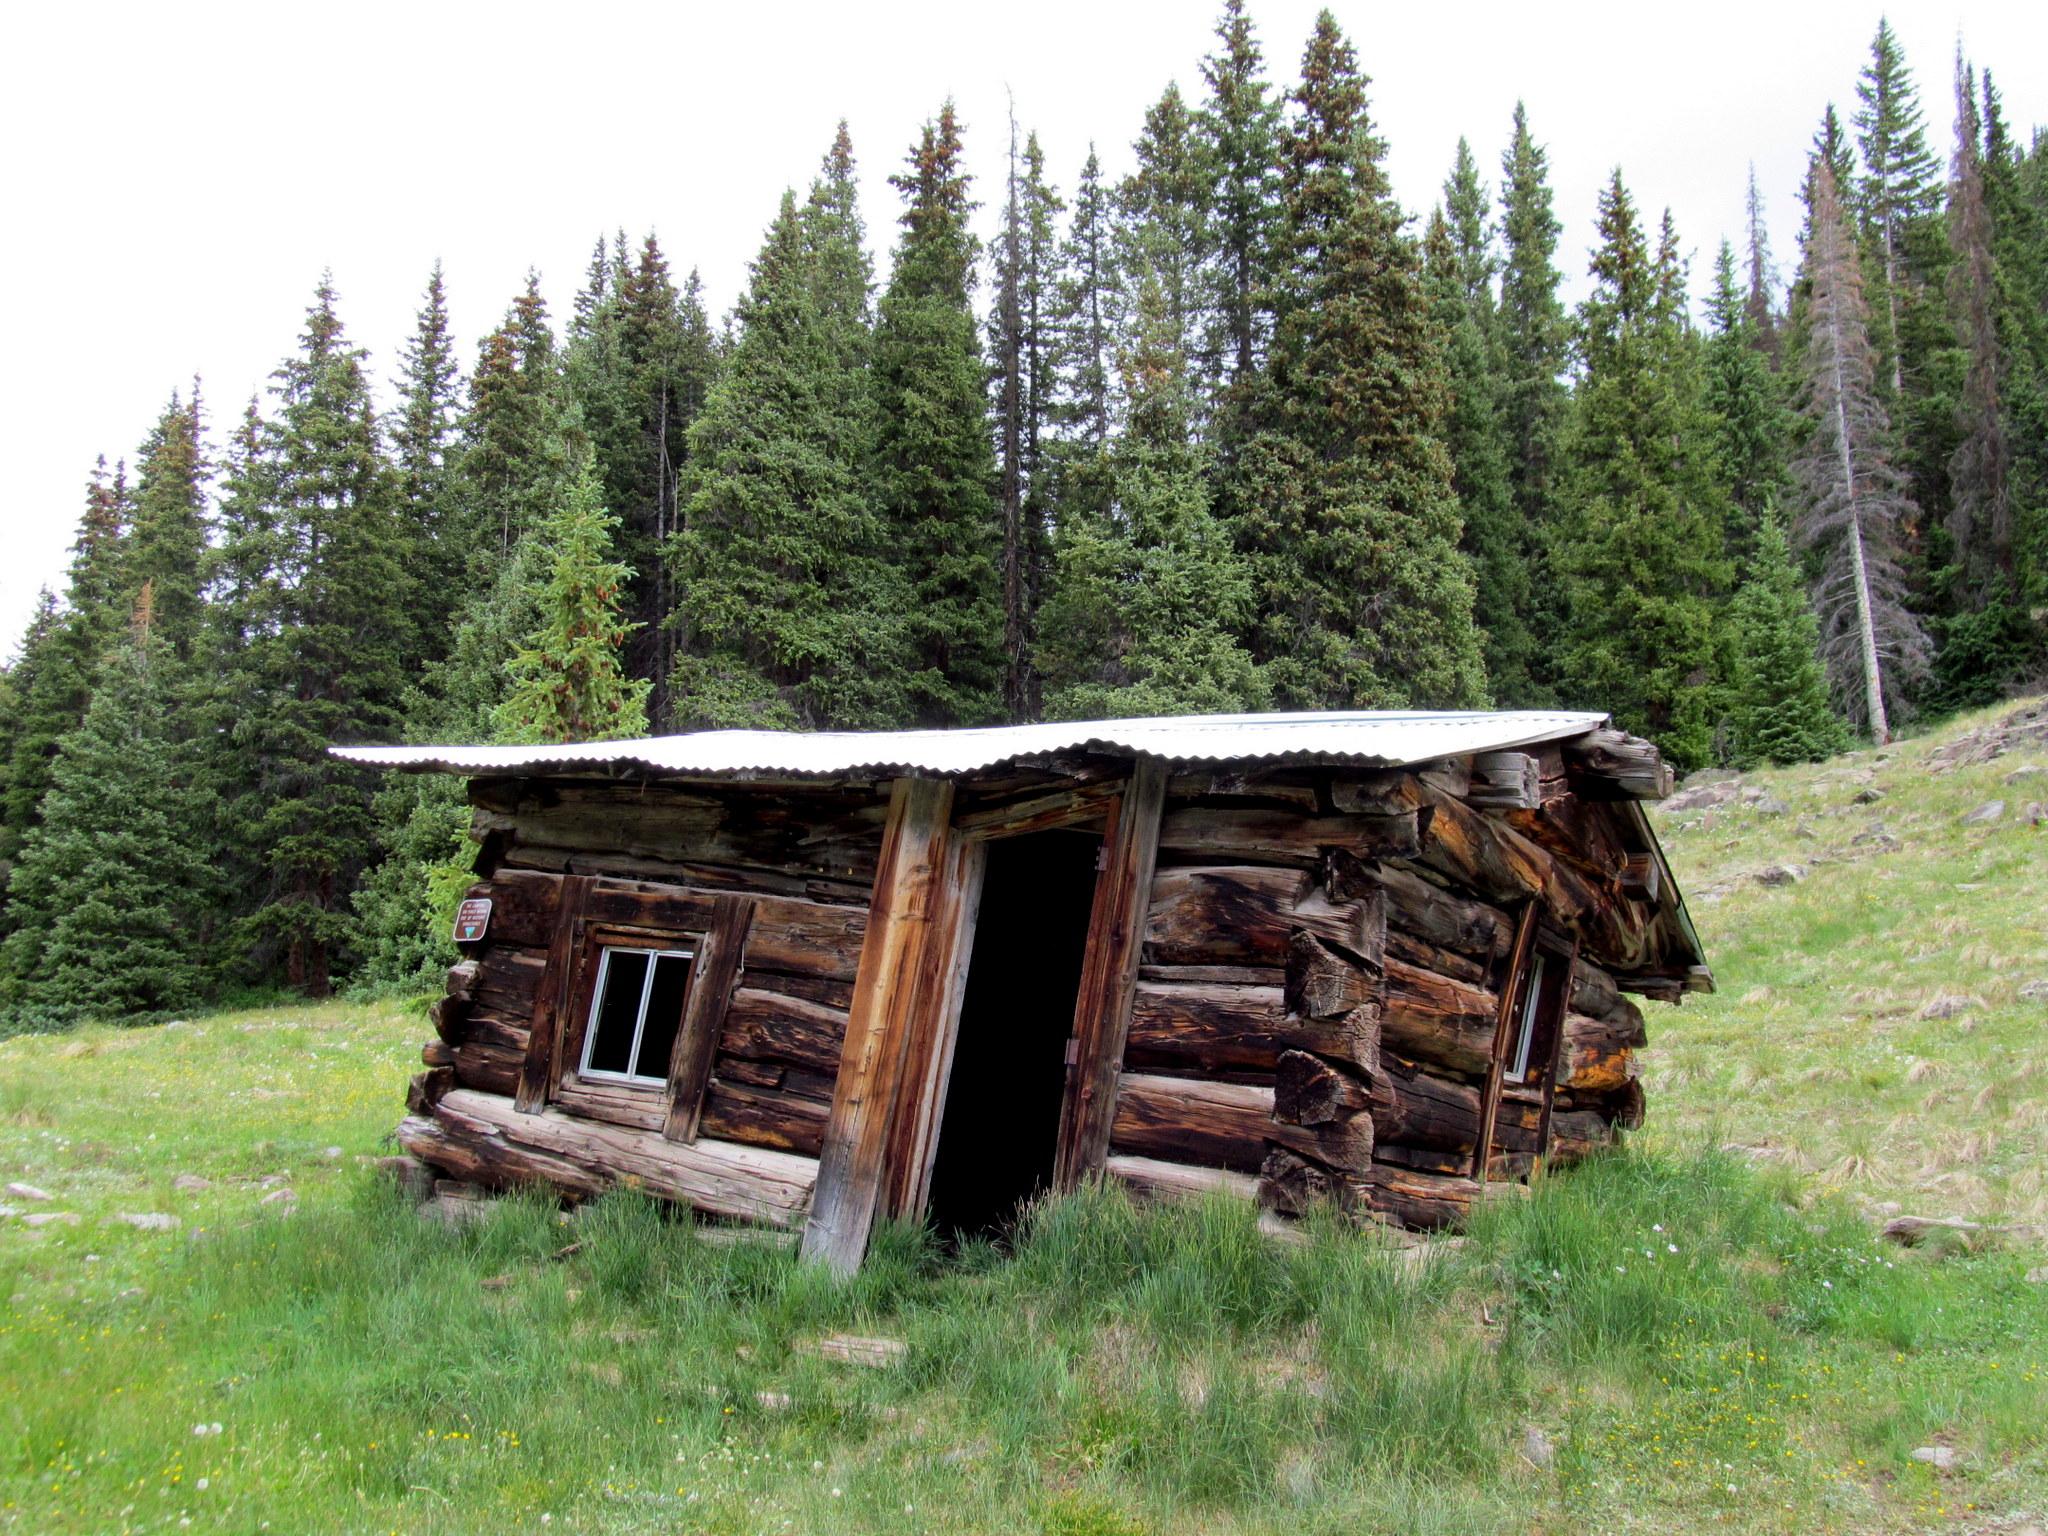 Photo: Leaning cabin near Redcloud Gulch